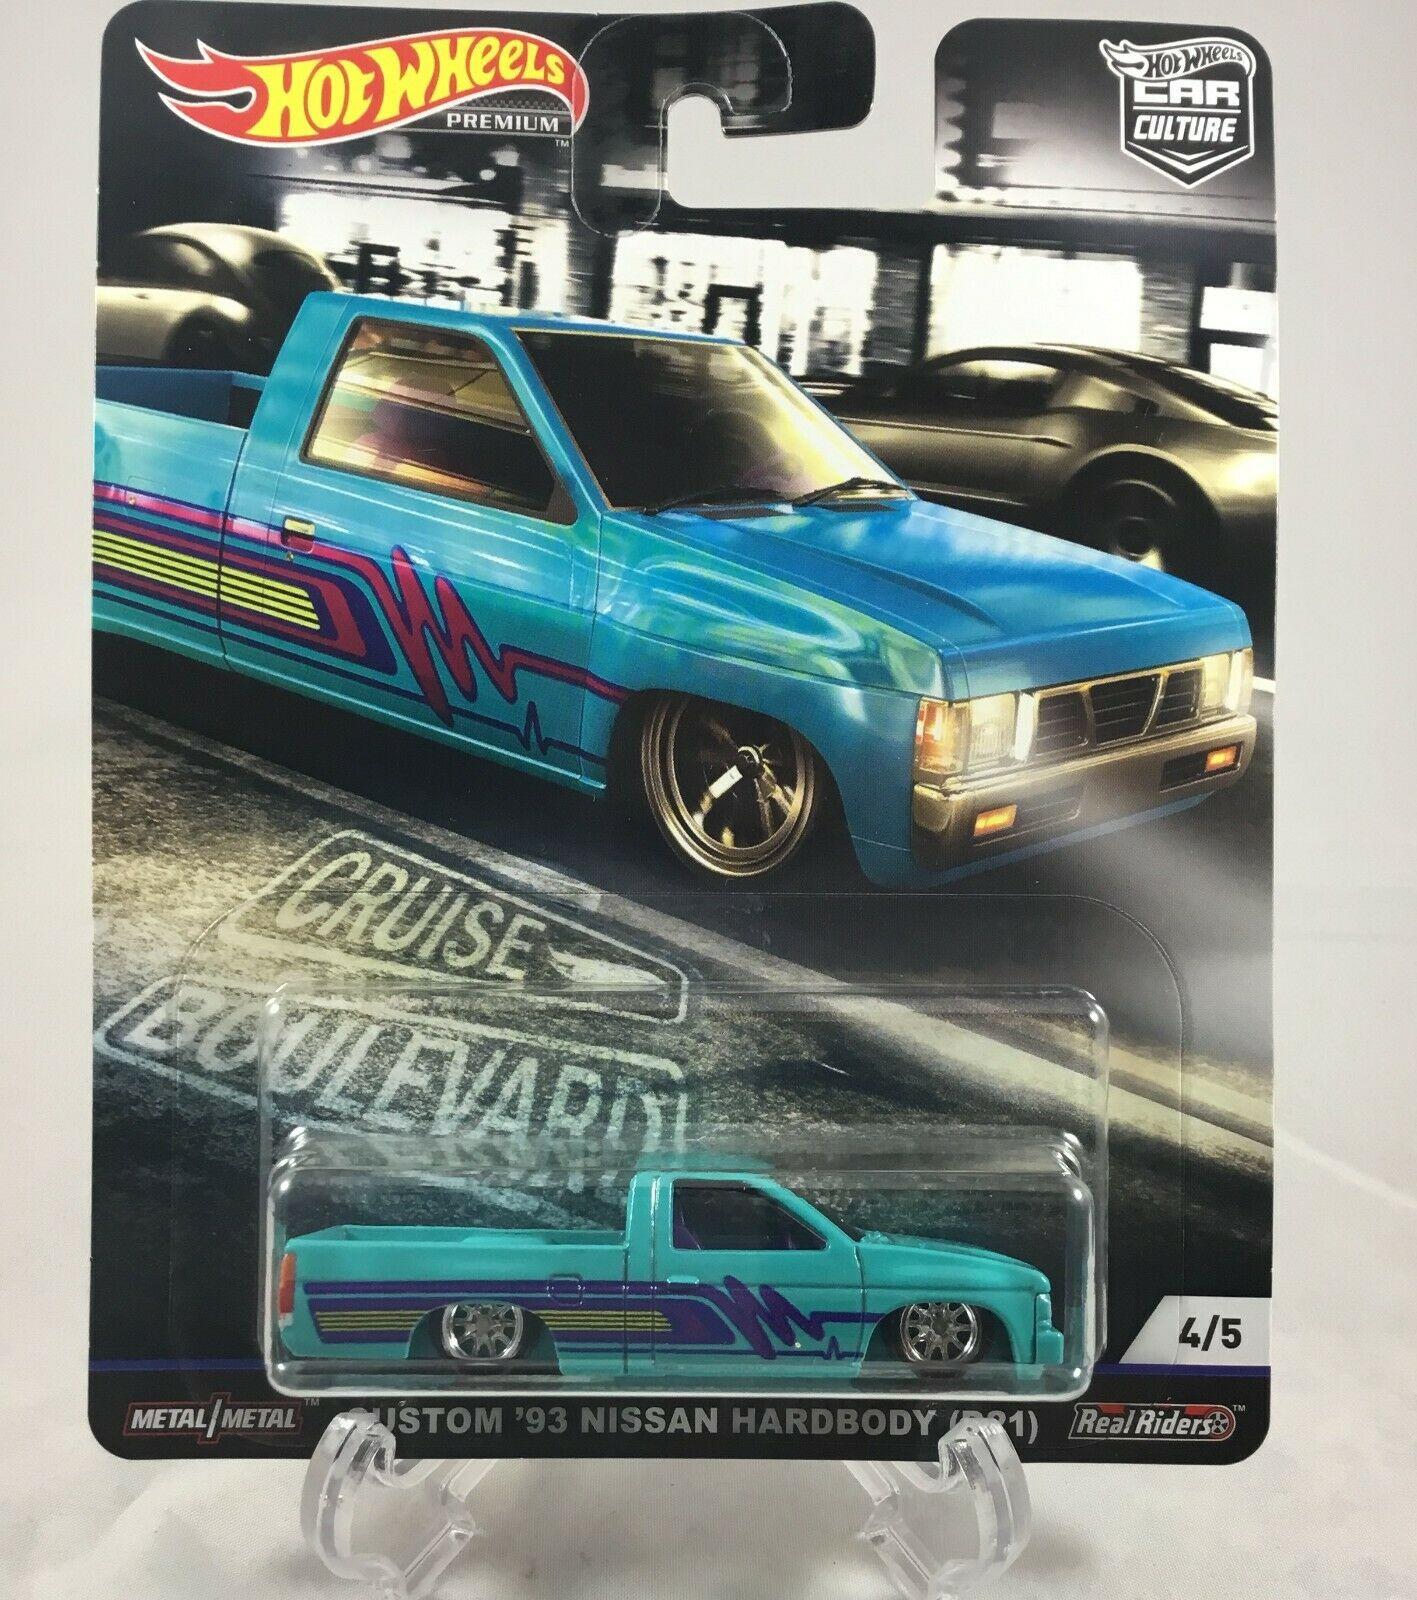 Hot Wheels - Custom 93 Nissan Hardbody (D21) - Cruise Boulevard - Car Culture